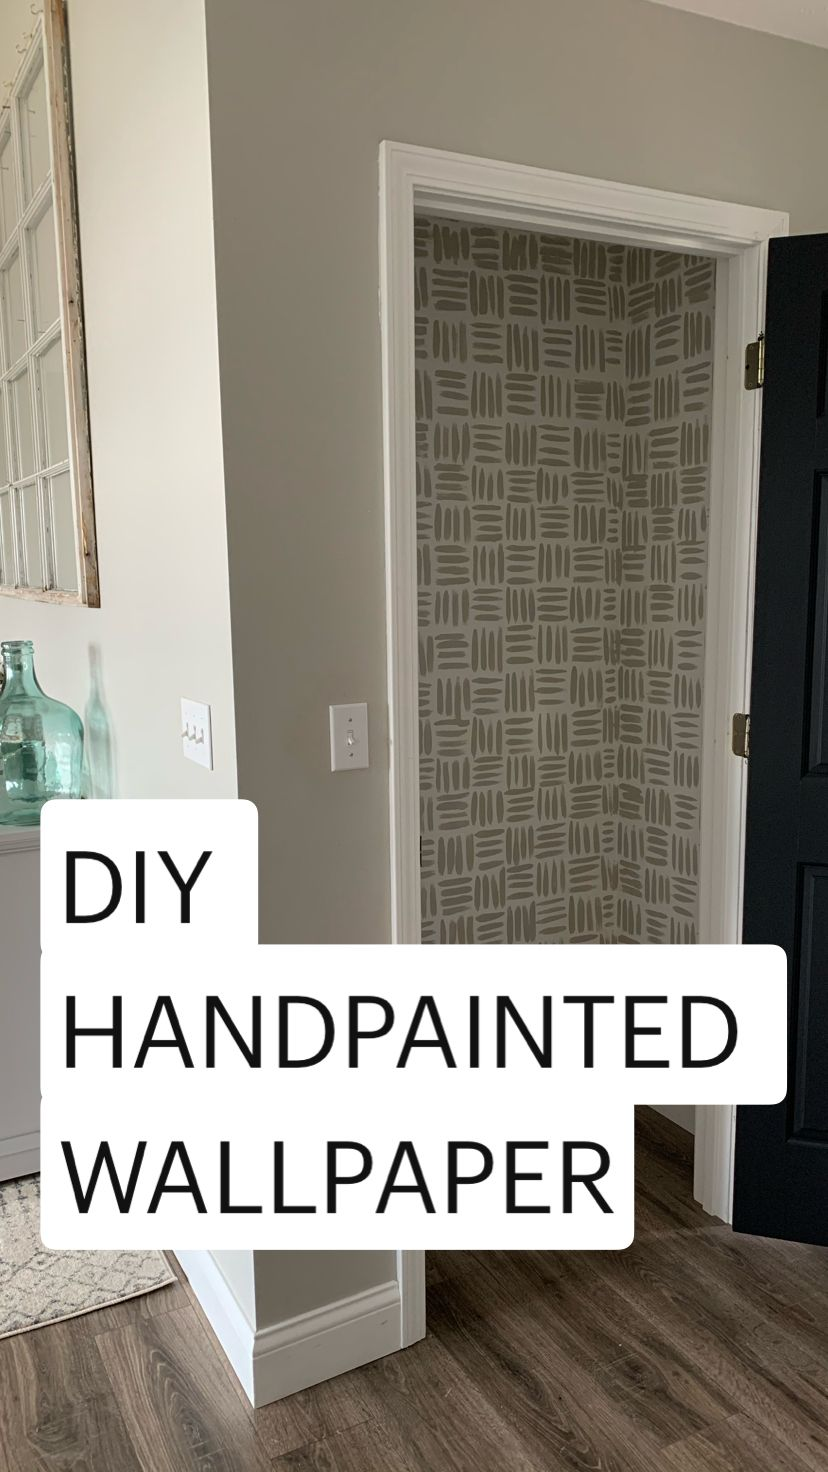 Photo of DIY HANDPAINTED WALLPAPER